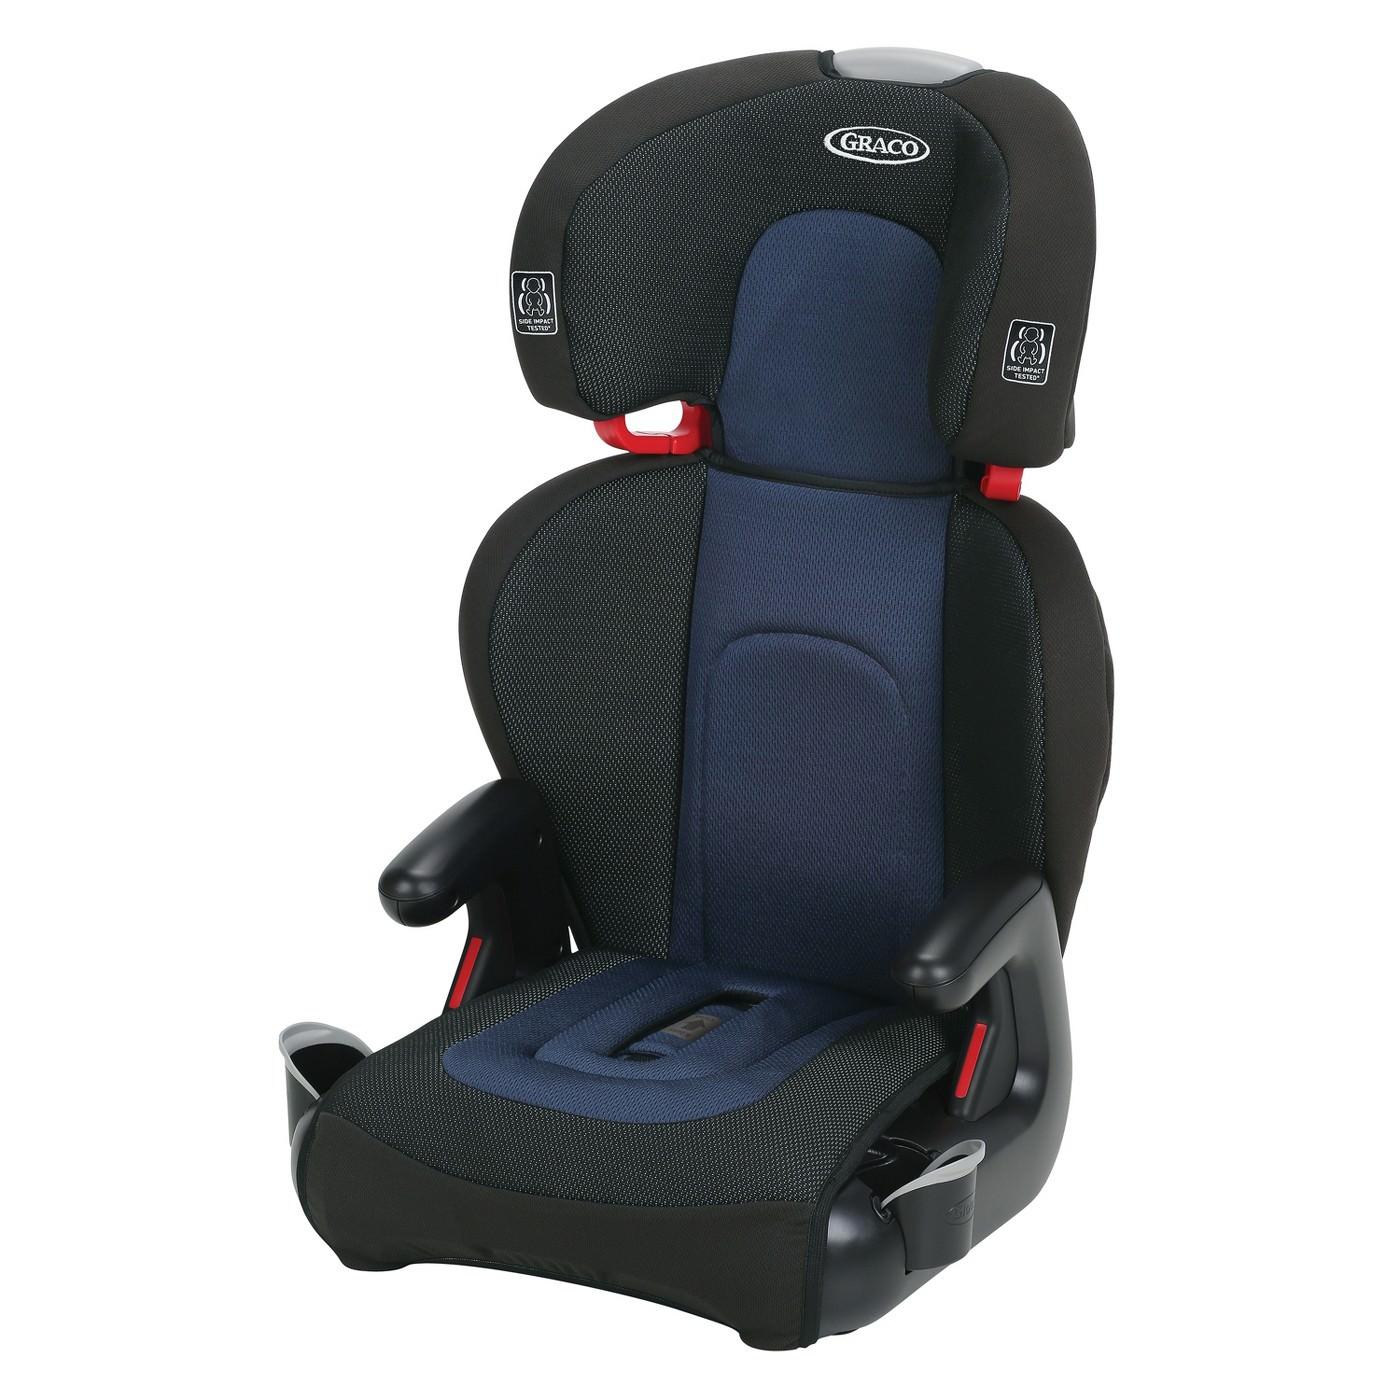 Graco TurboBooster TakeAlong Highback Booster Car Seat, Lark